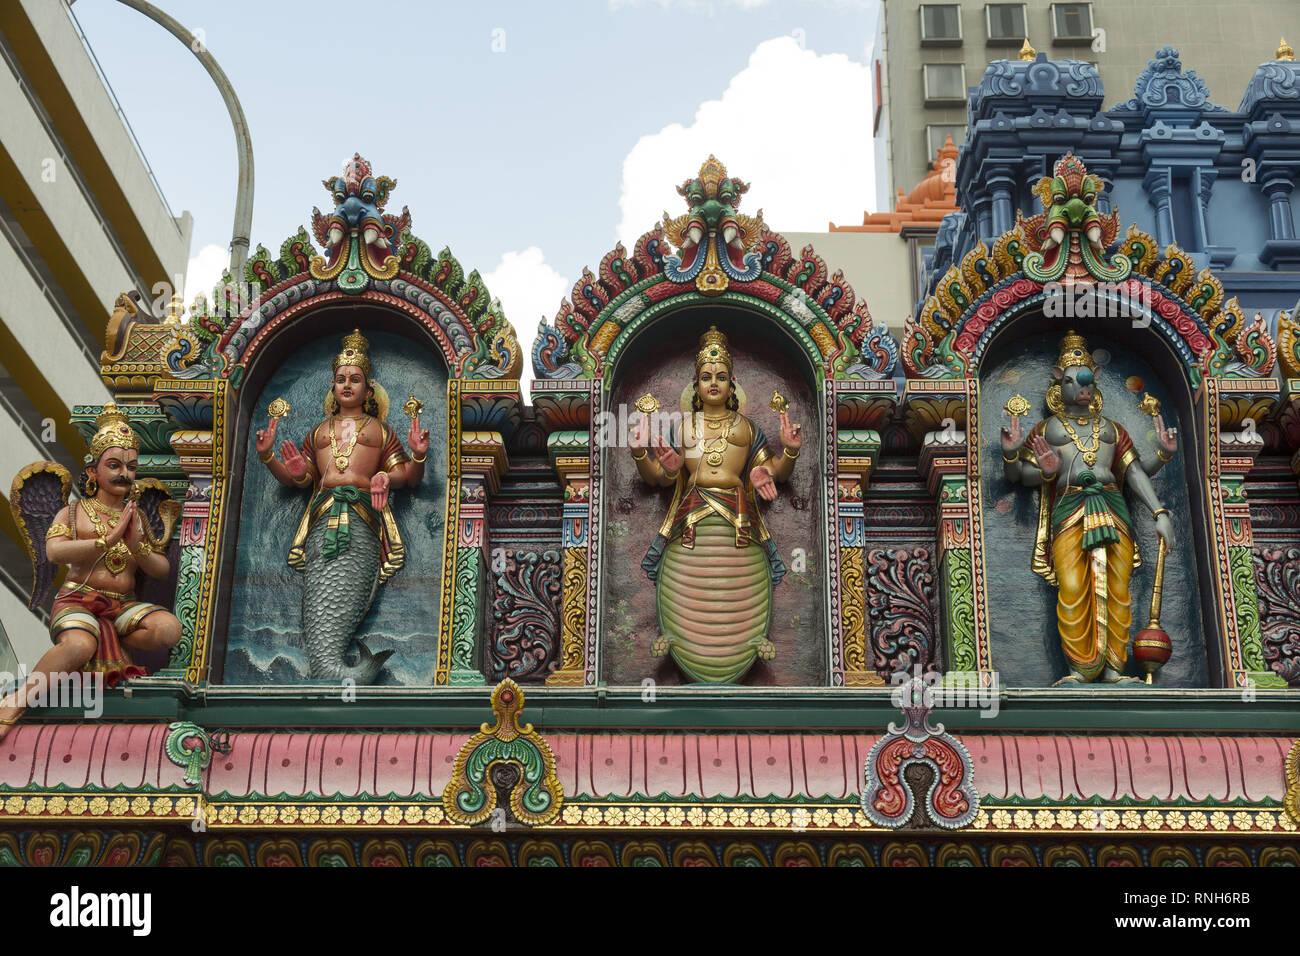 Hindu-Tempel in Singapur Stockfoto